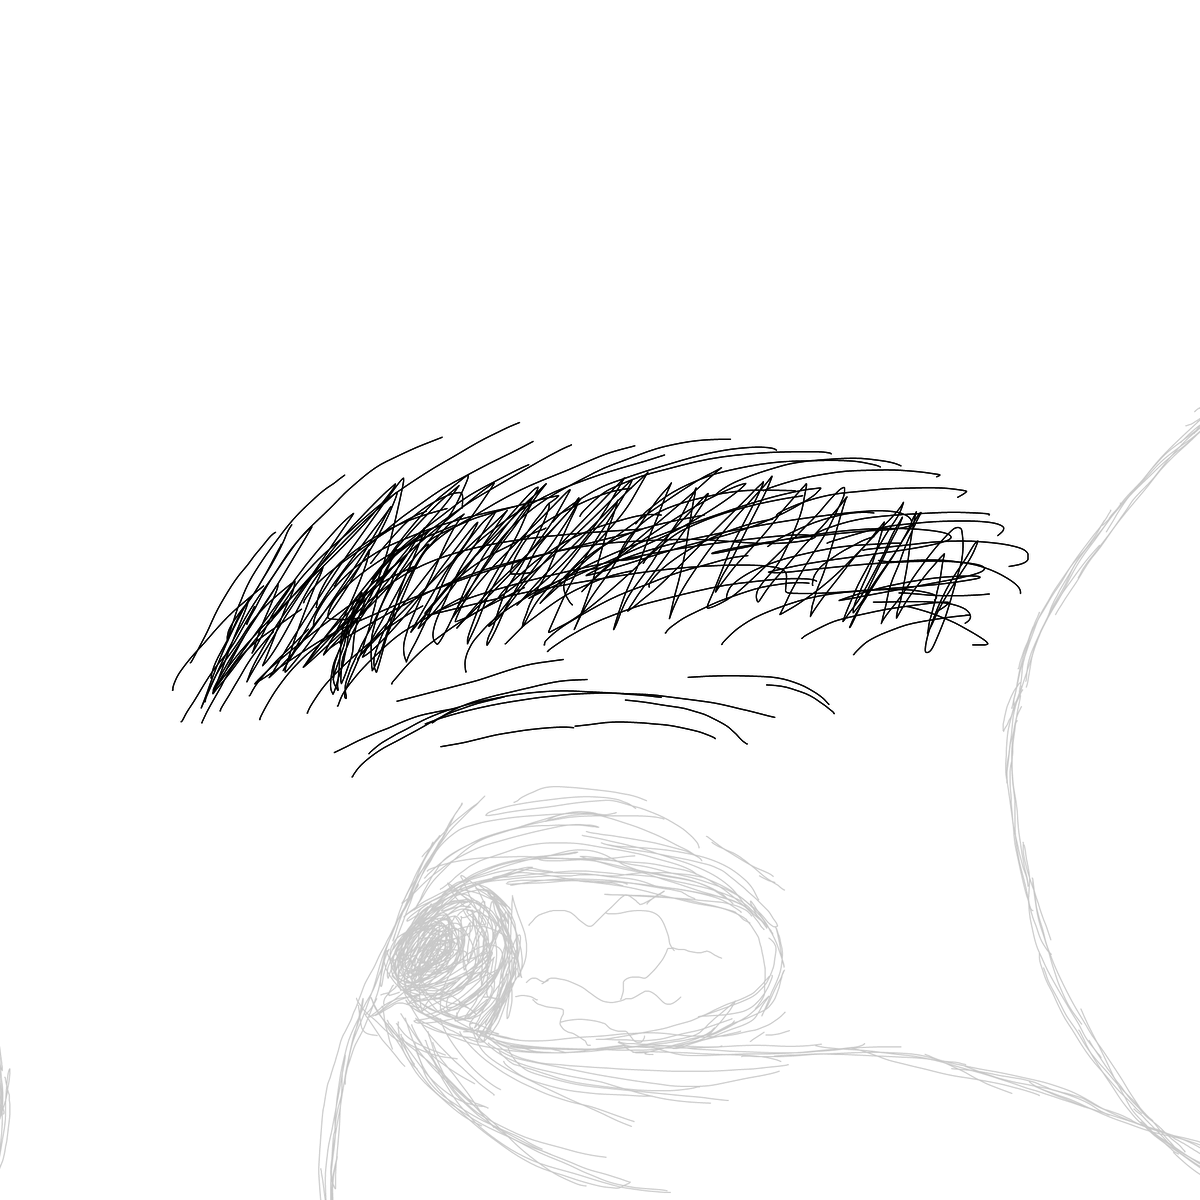 BAAAM drawing#18937 lat:-23.5476741790771500lng: -46.6354446411132800